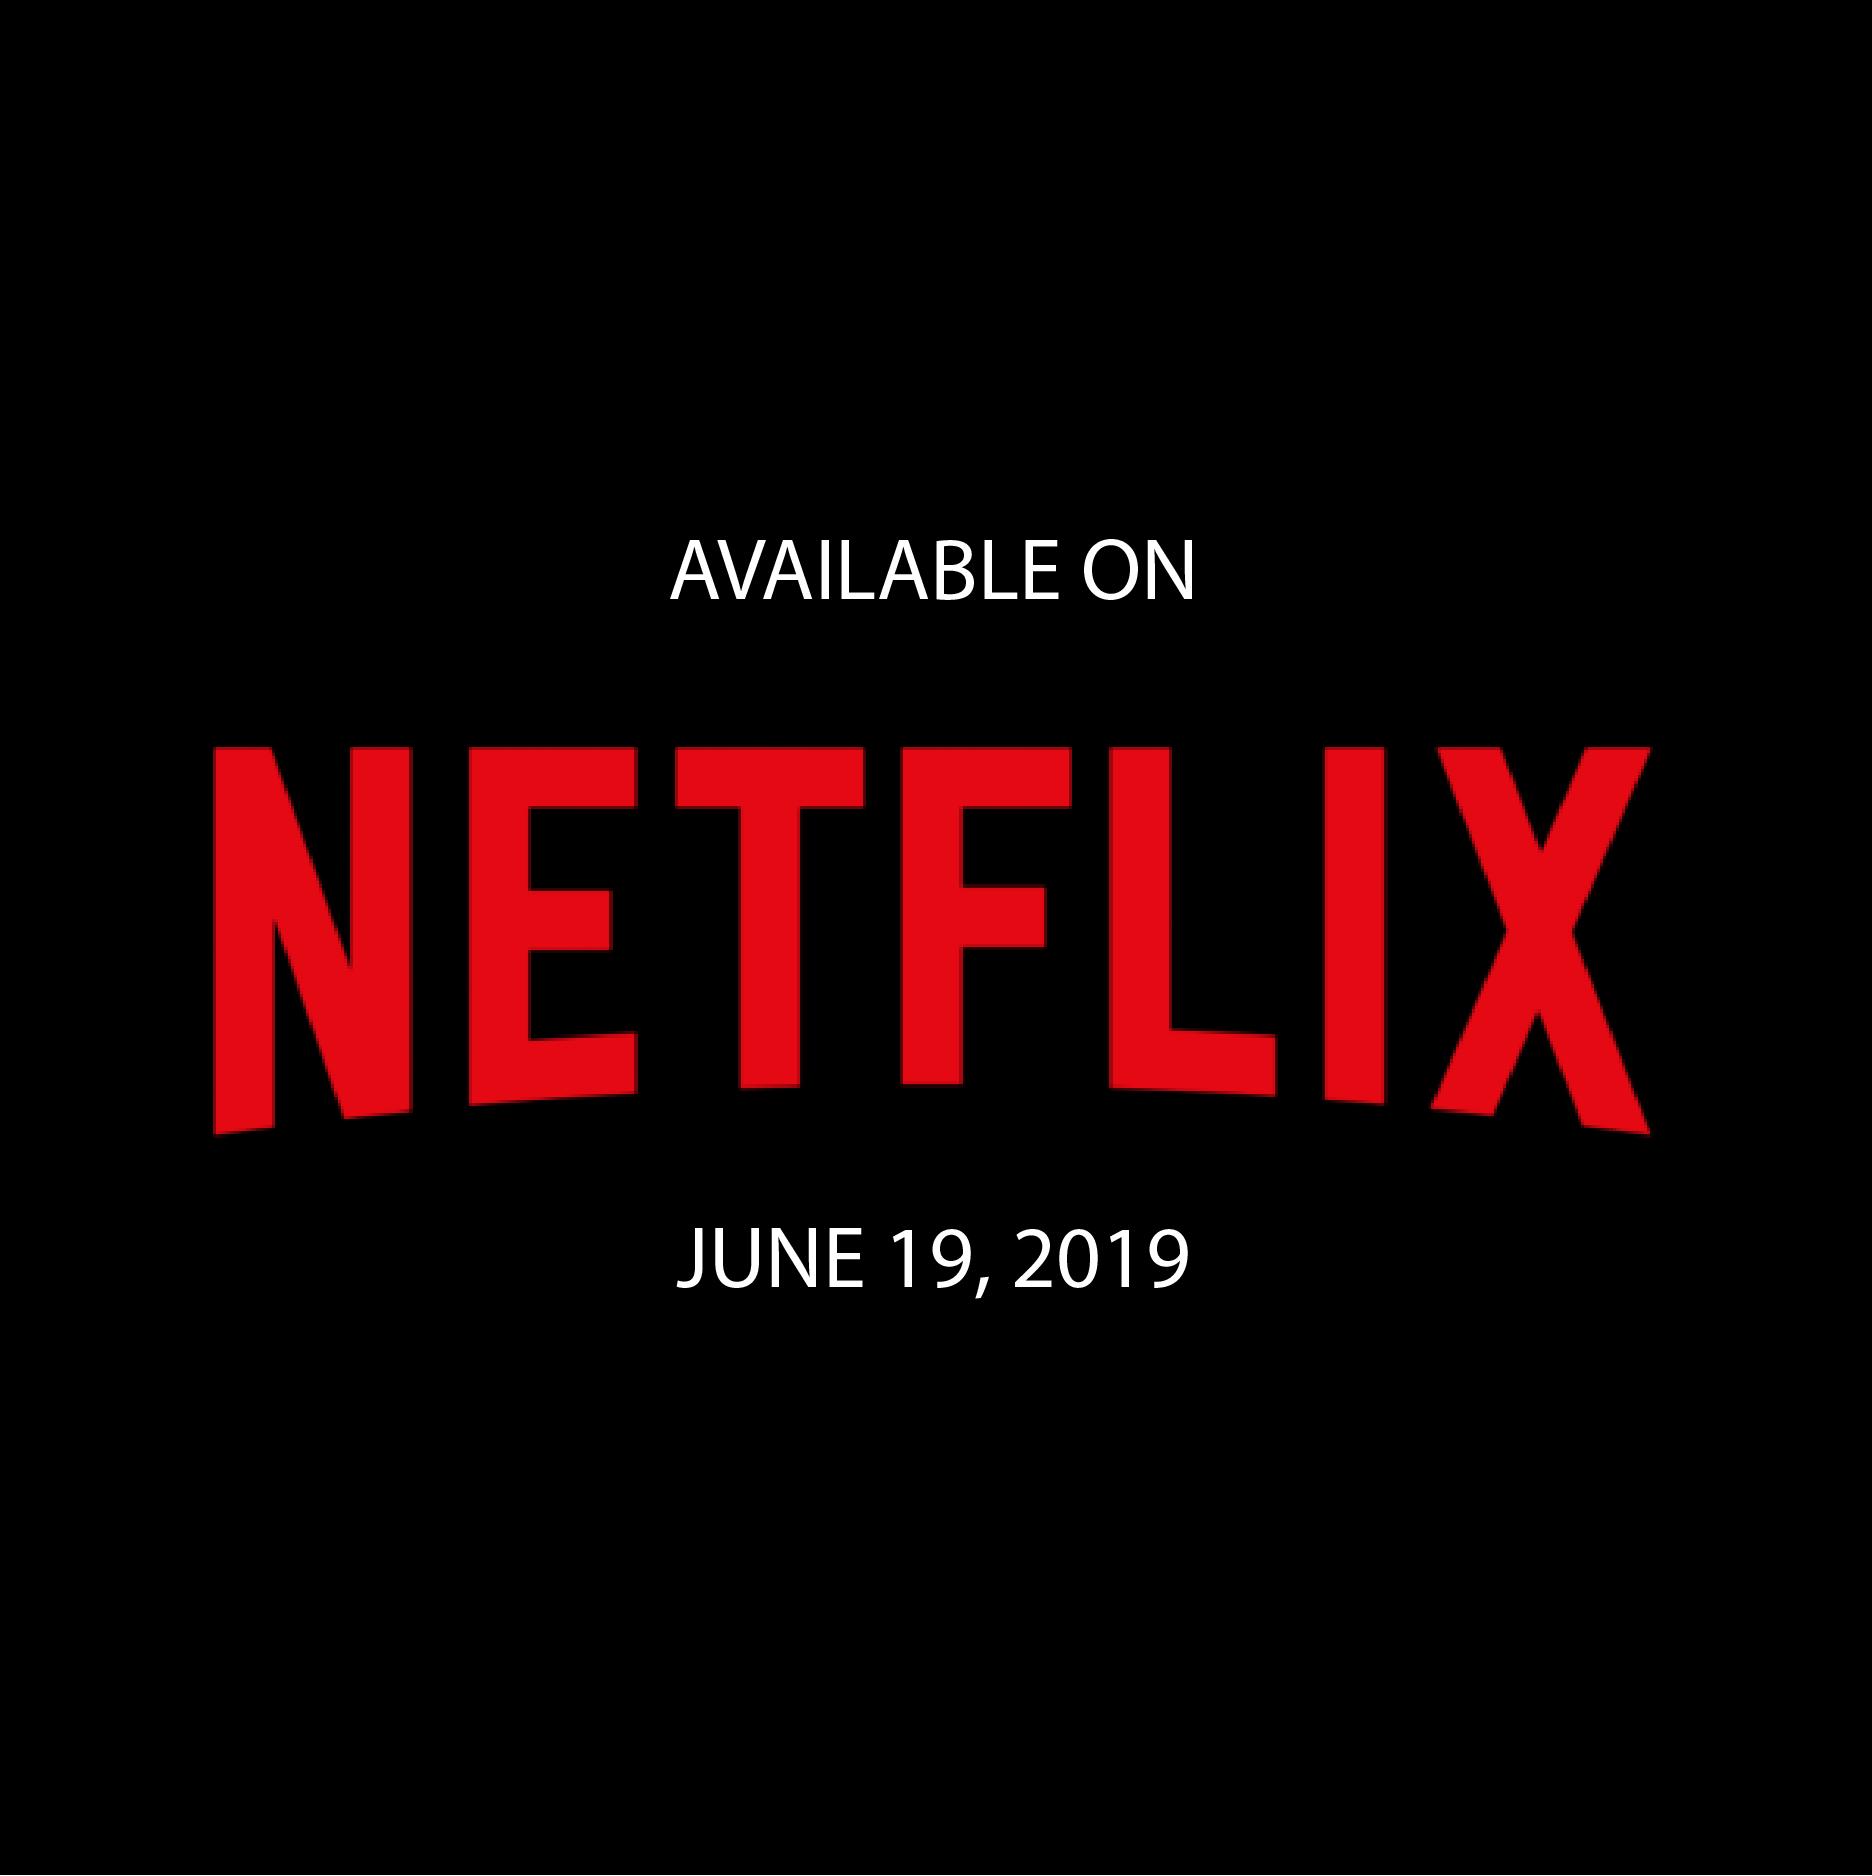 Red Netflix.png